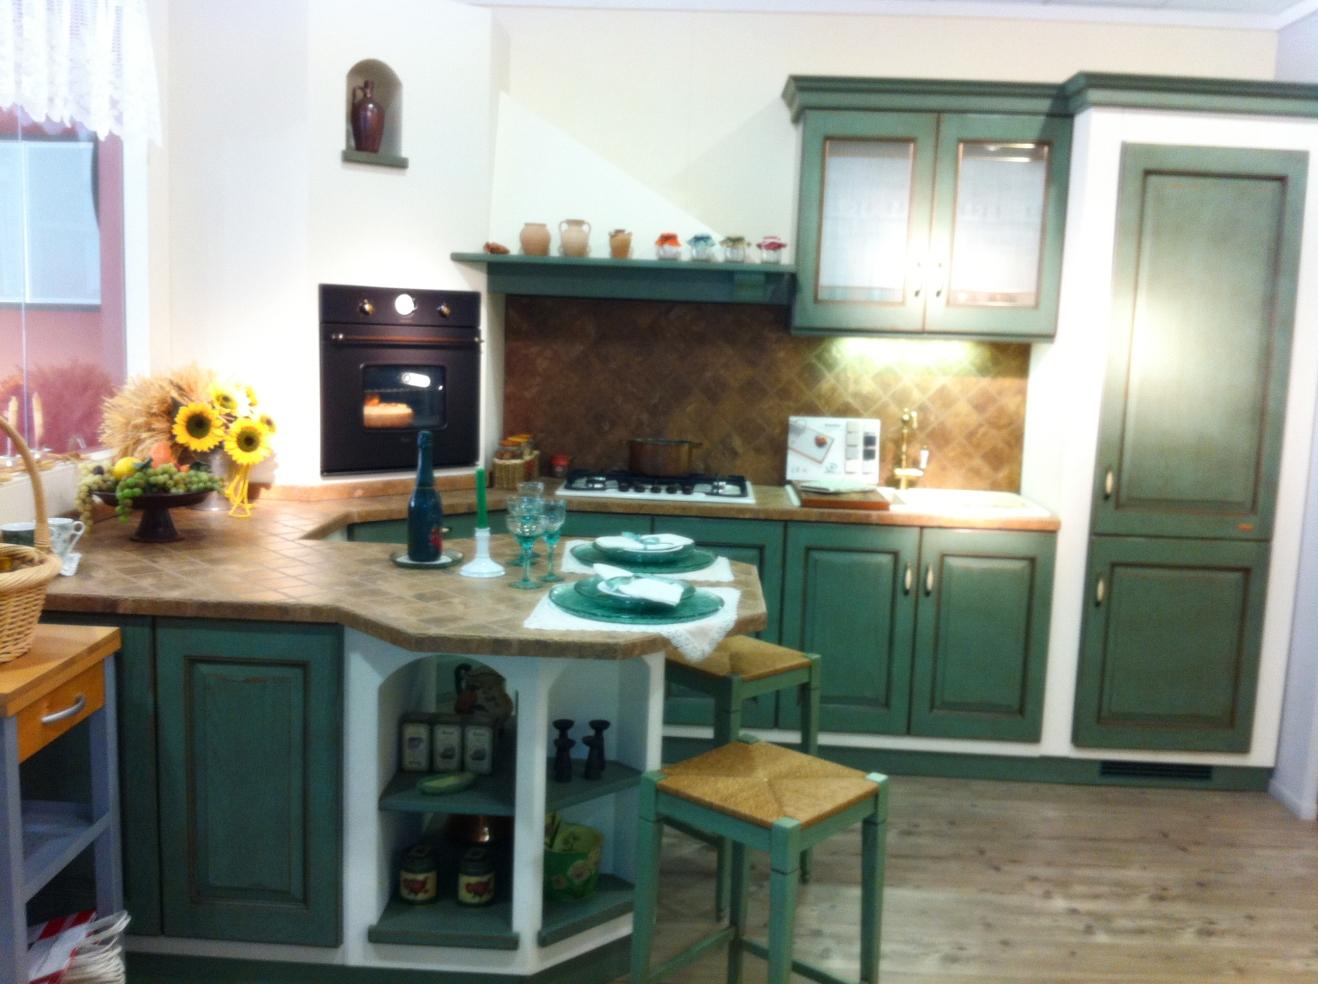 Offerta Scavolini Belvedere - Cucine a prezzi scontati